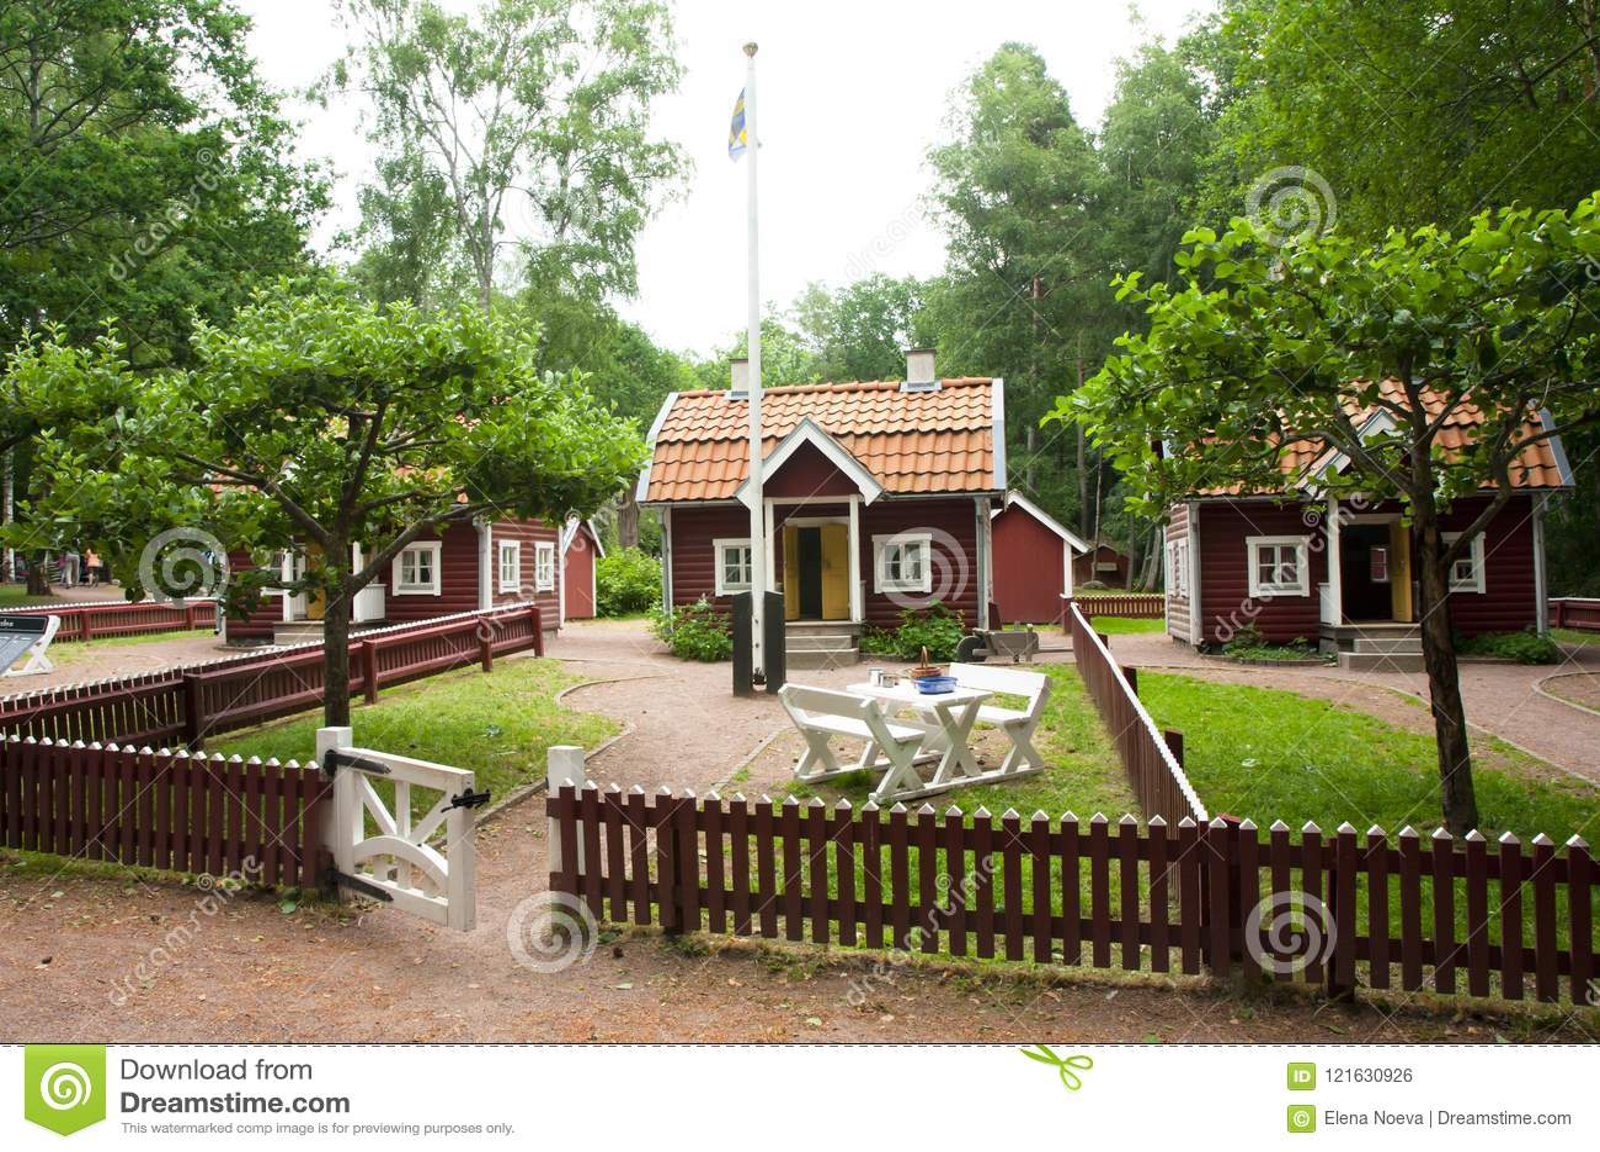 VIMMERBY, ZWEDEN - Juni 19 2018 - de Wereld van Astrid Lindgren ` s, Astrid Lindgrens Varld-themapark Bullerby lawaaierig dorp